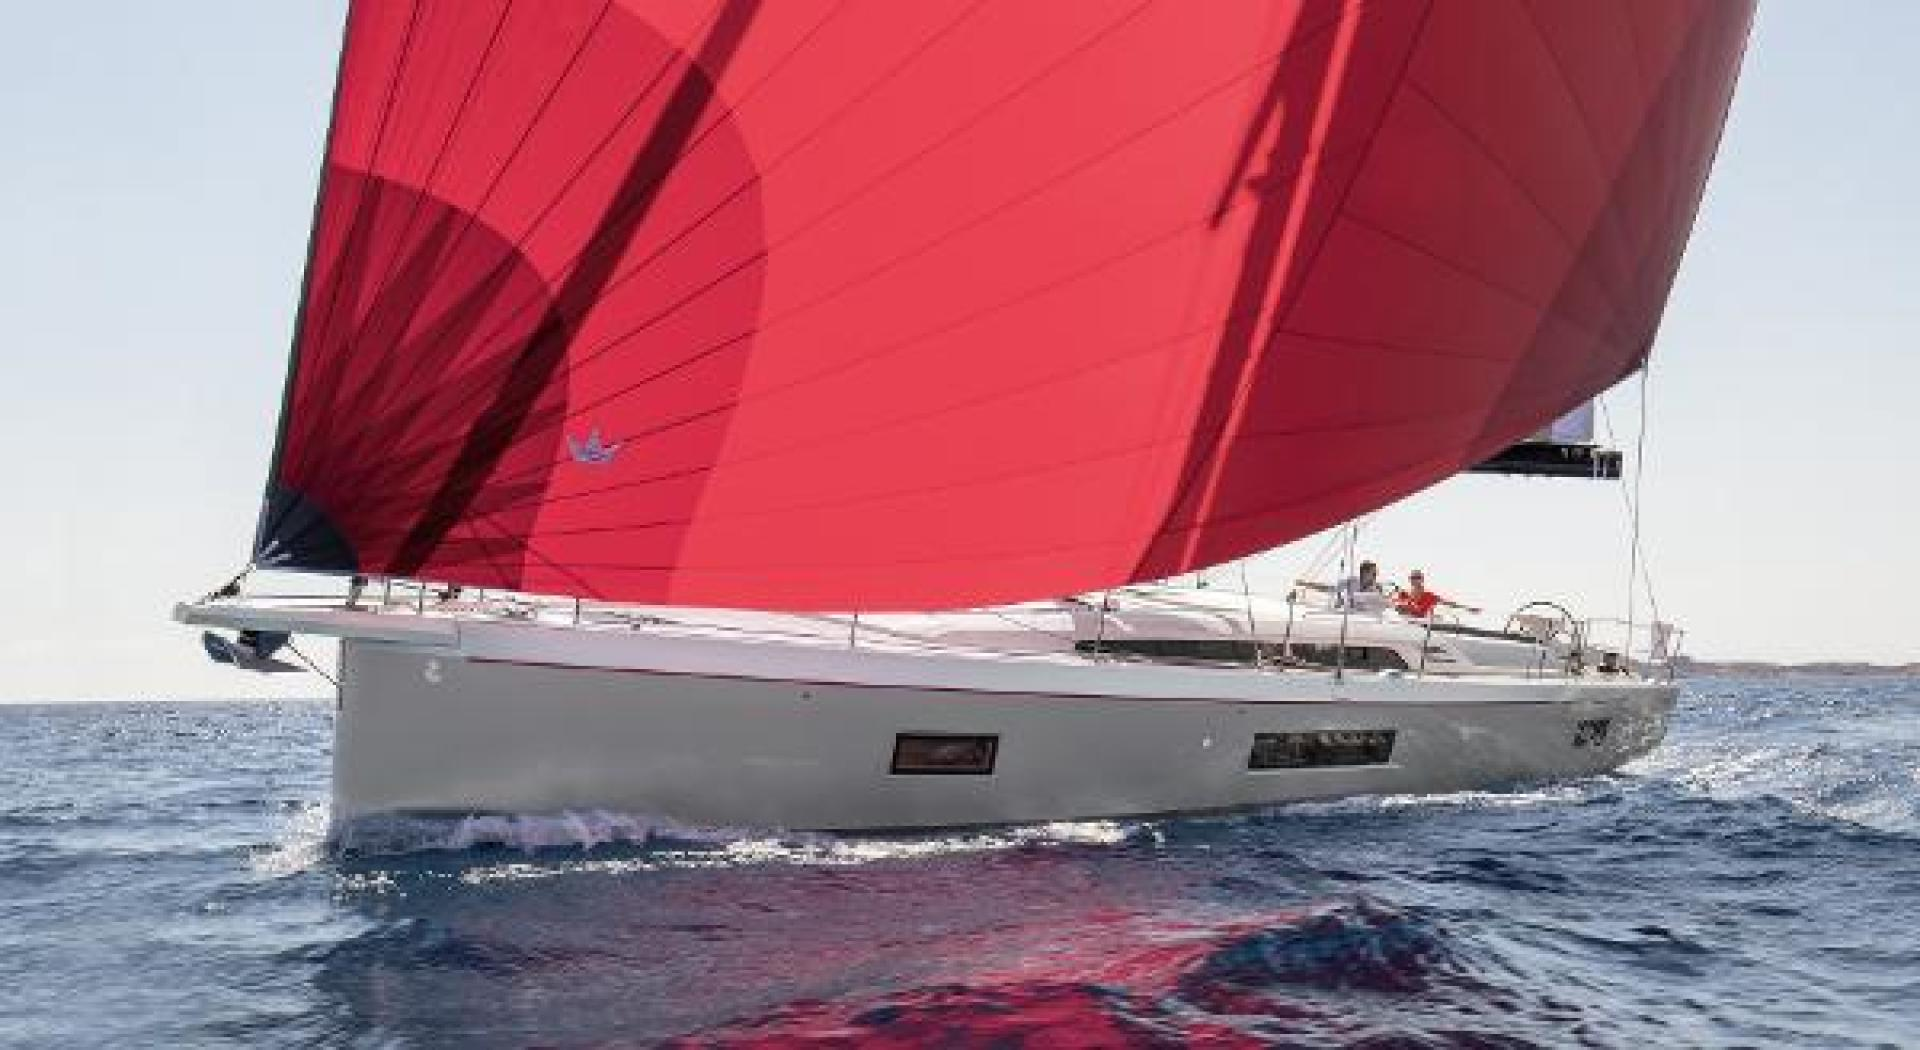 51' Beneteau 2019 Oceanis 51.1 In Stock